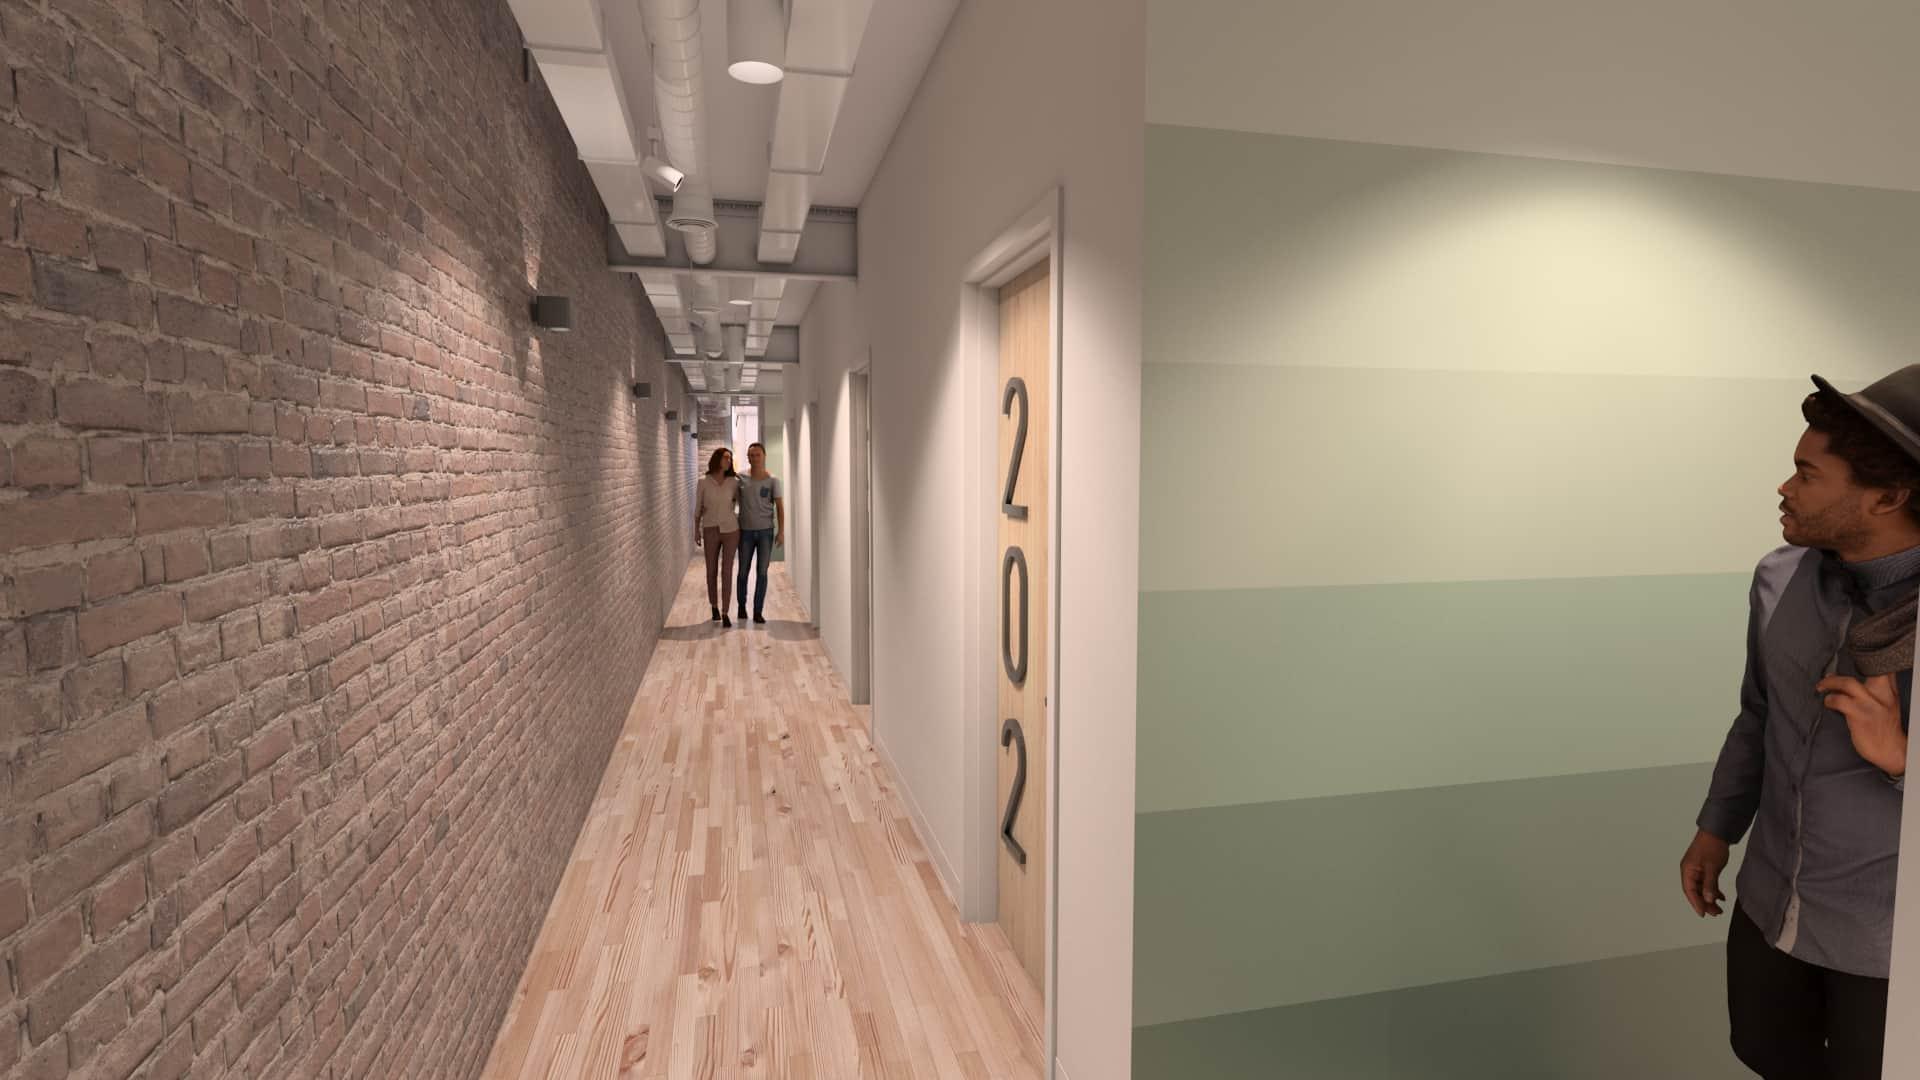 Photo looking down SOVA hallway with people walking